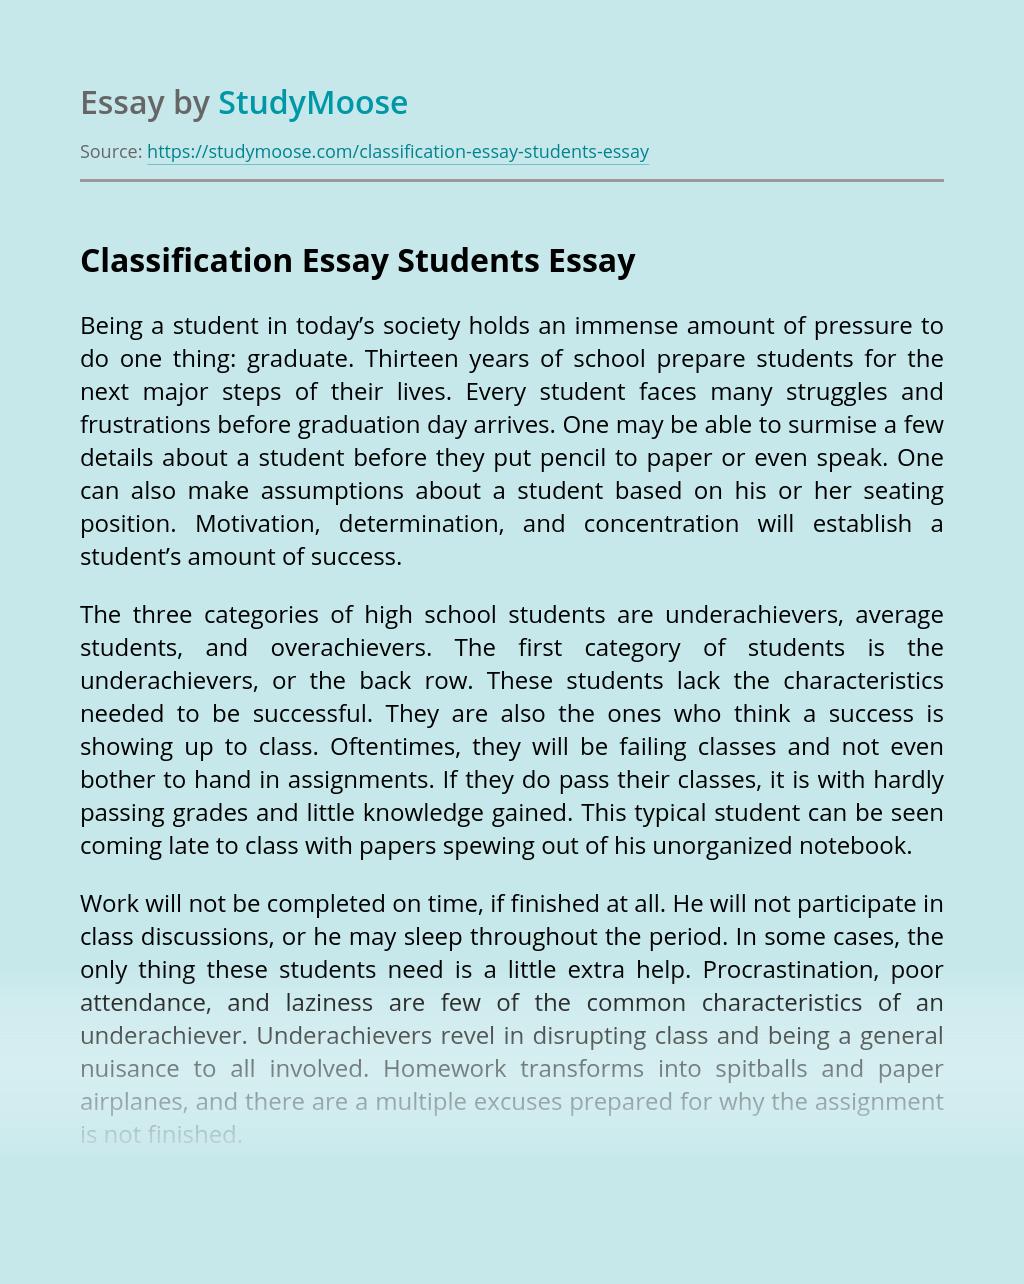 Classification Essay Students